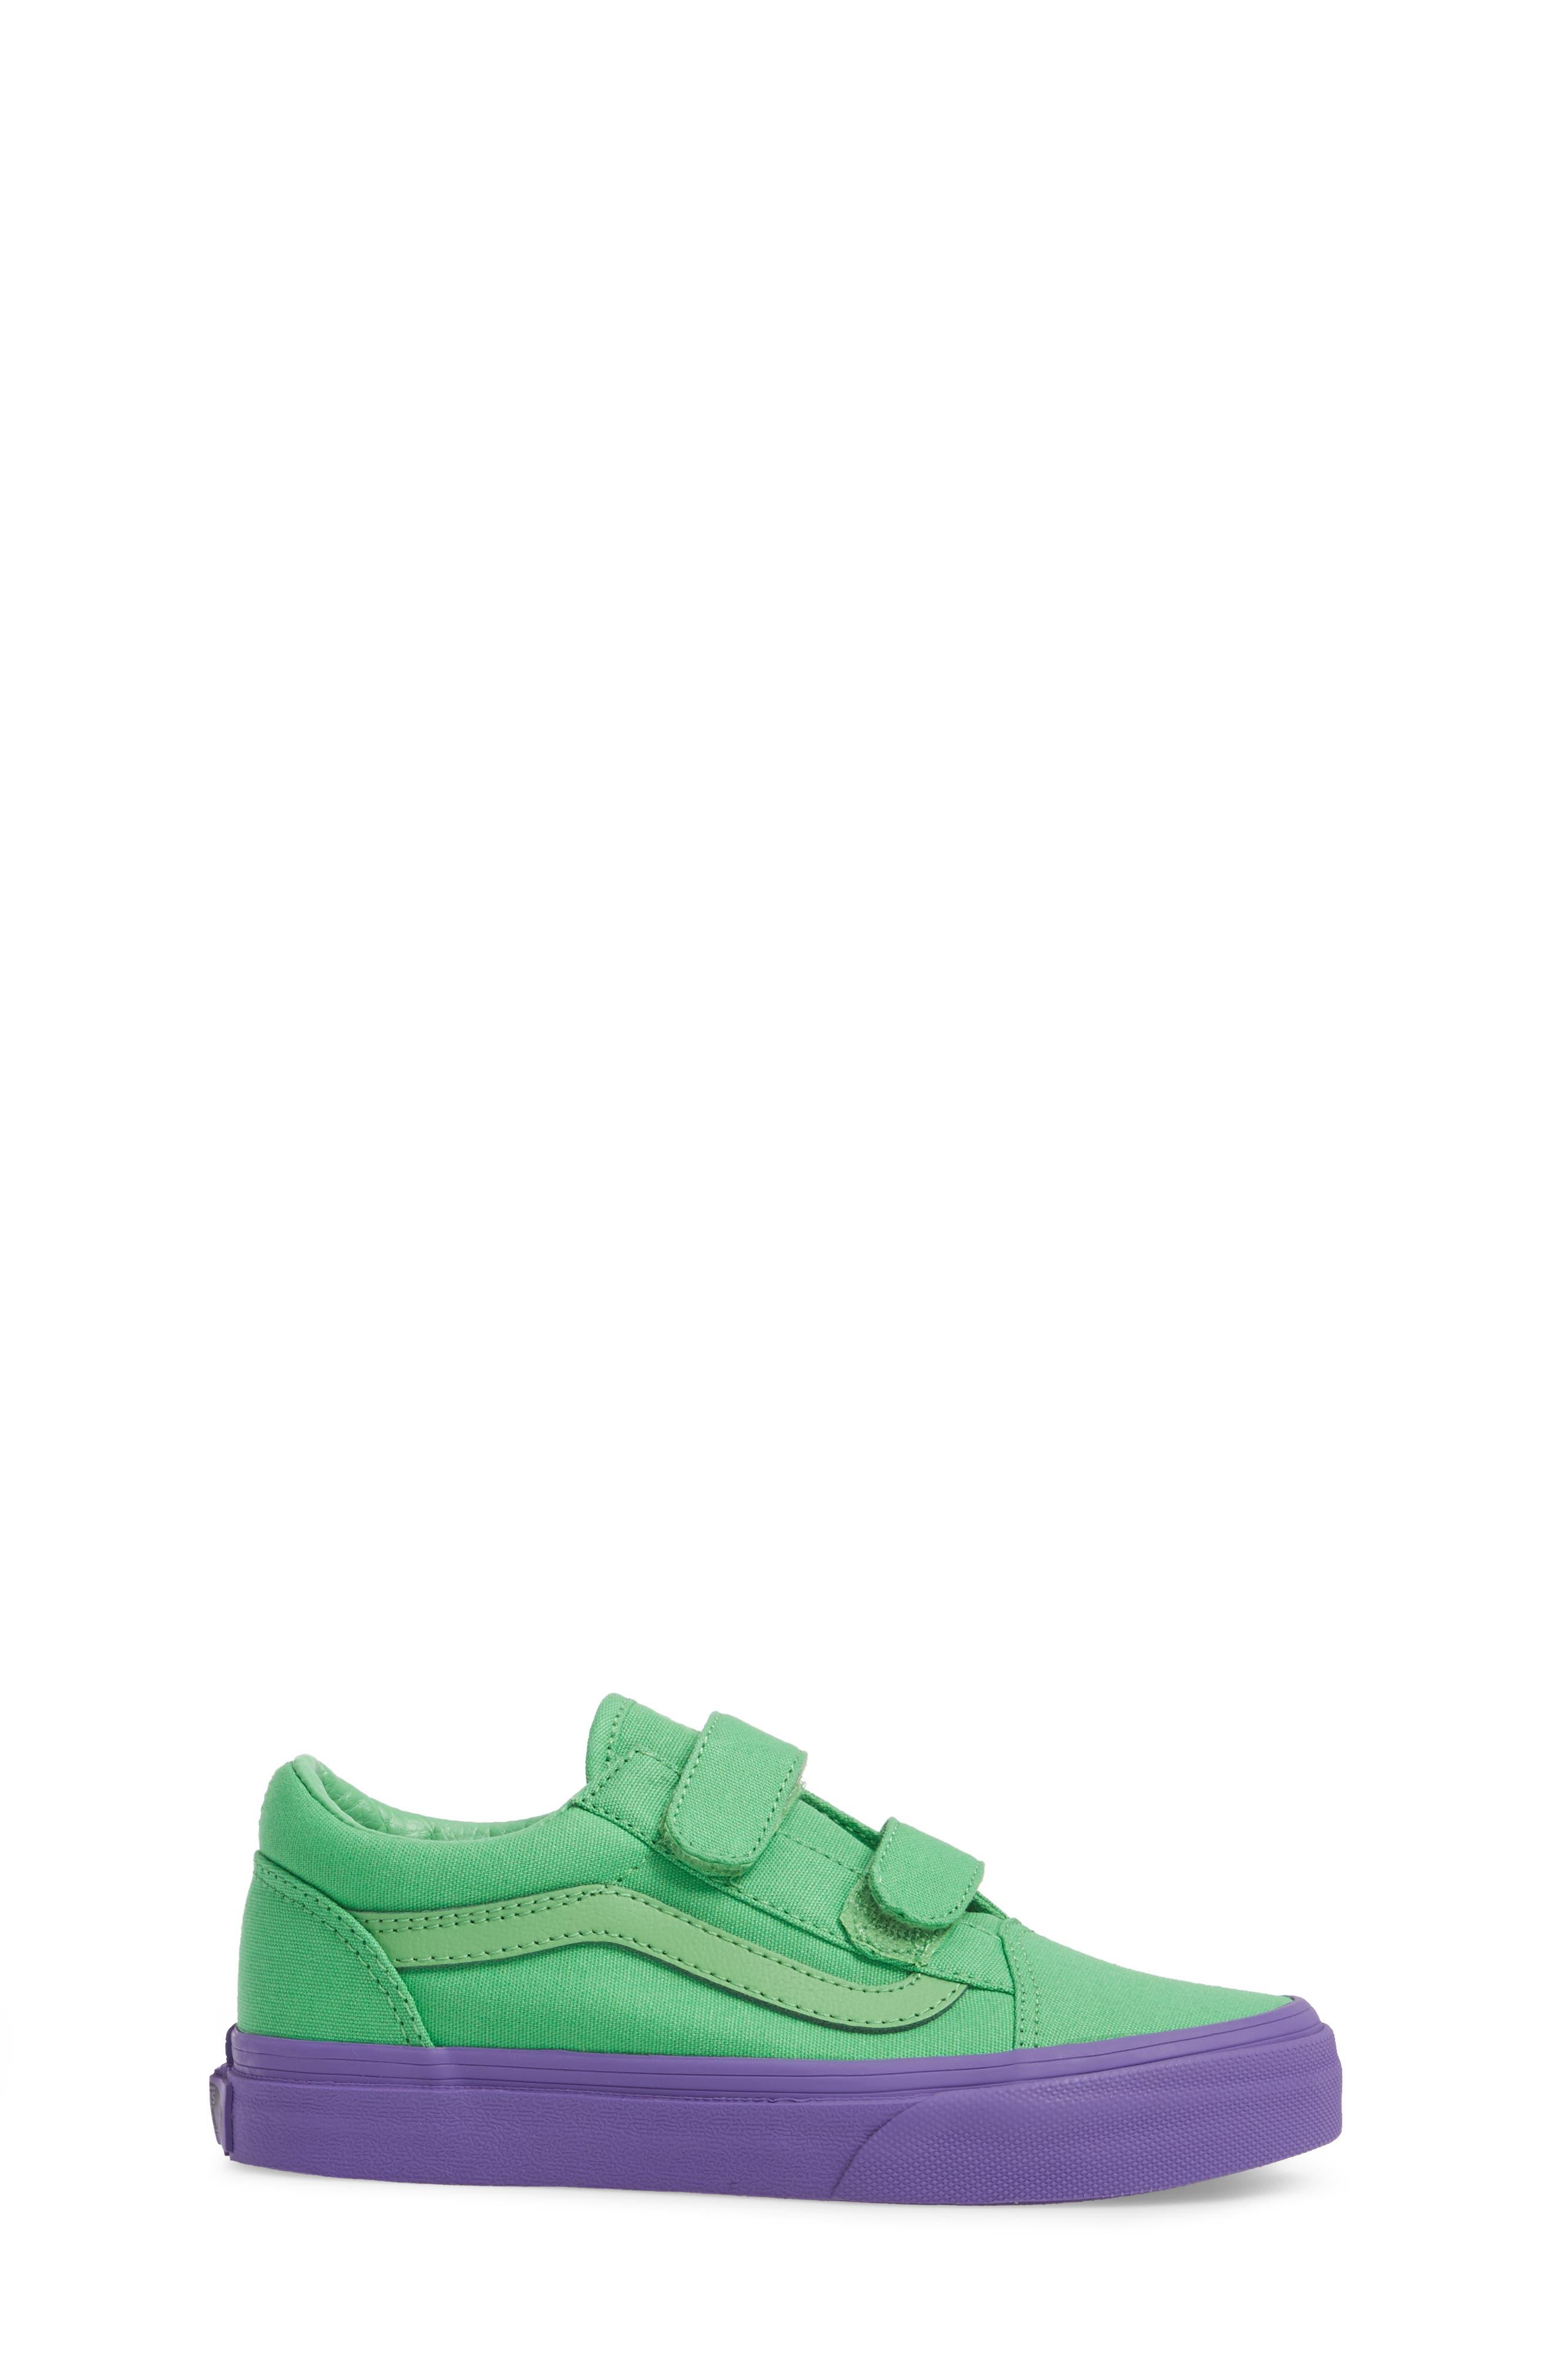 Old Skool V Sneaker,                             Alternate thumbnail 3, color,                             Green/ Purple Cosplay